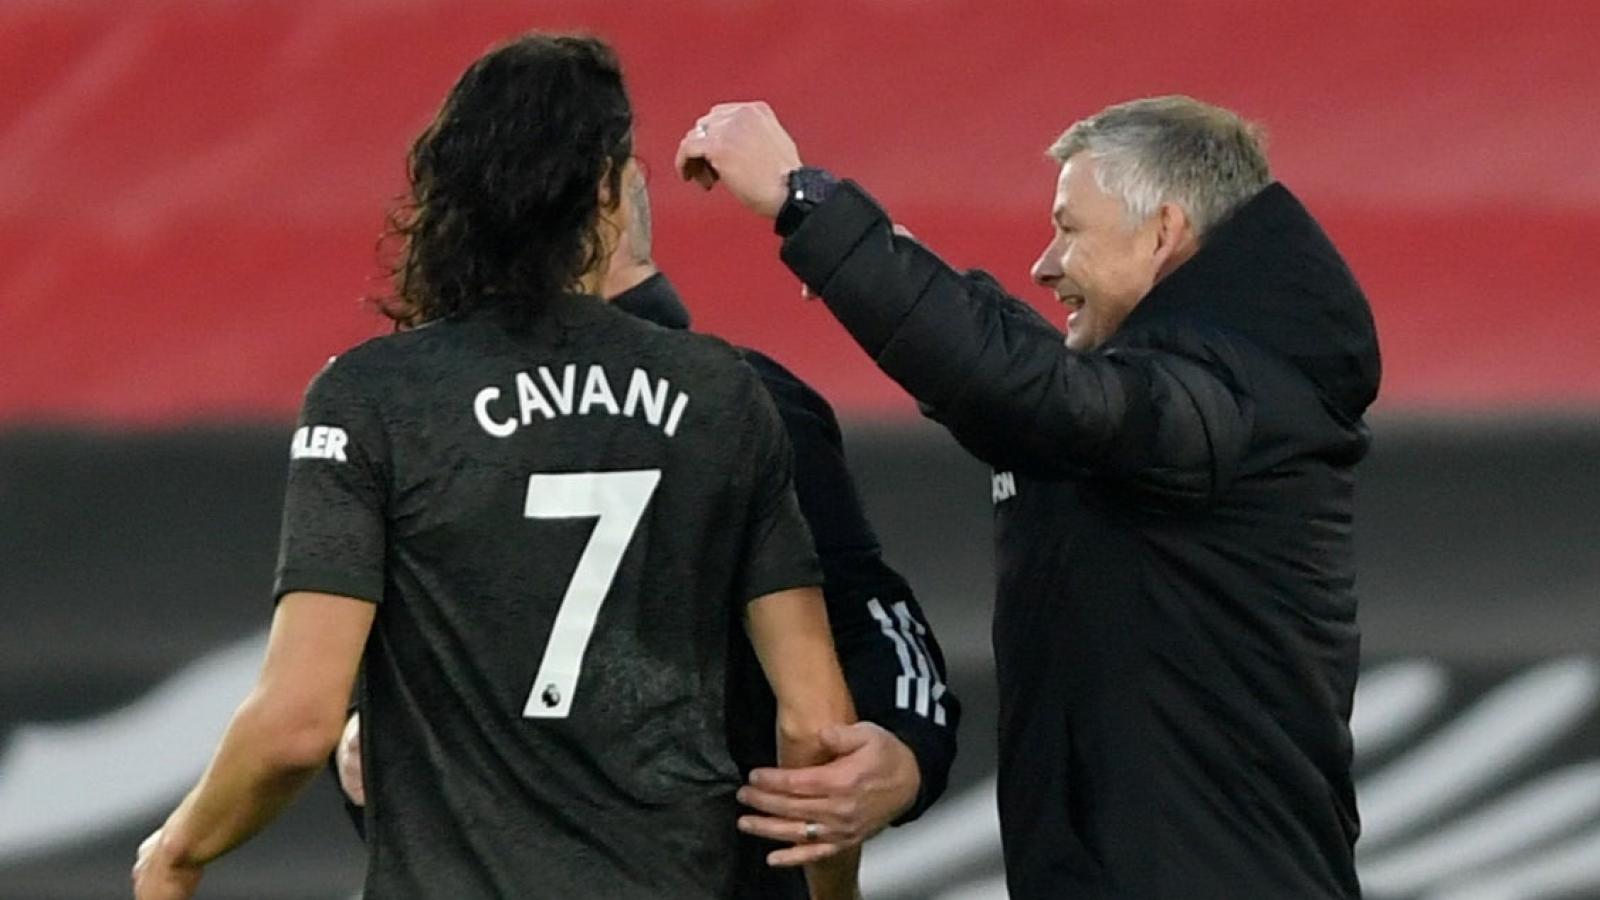 Cavani tái hiện kỳ tích của Solskjaer ở Premier League cách đây 21 năm